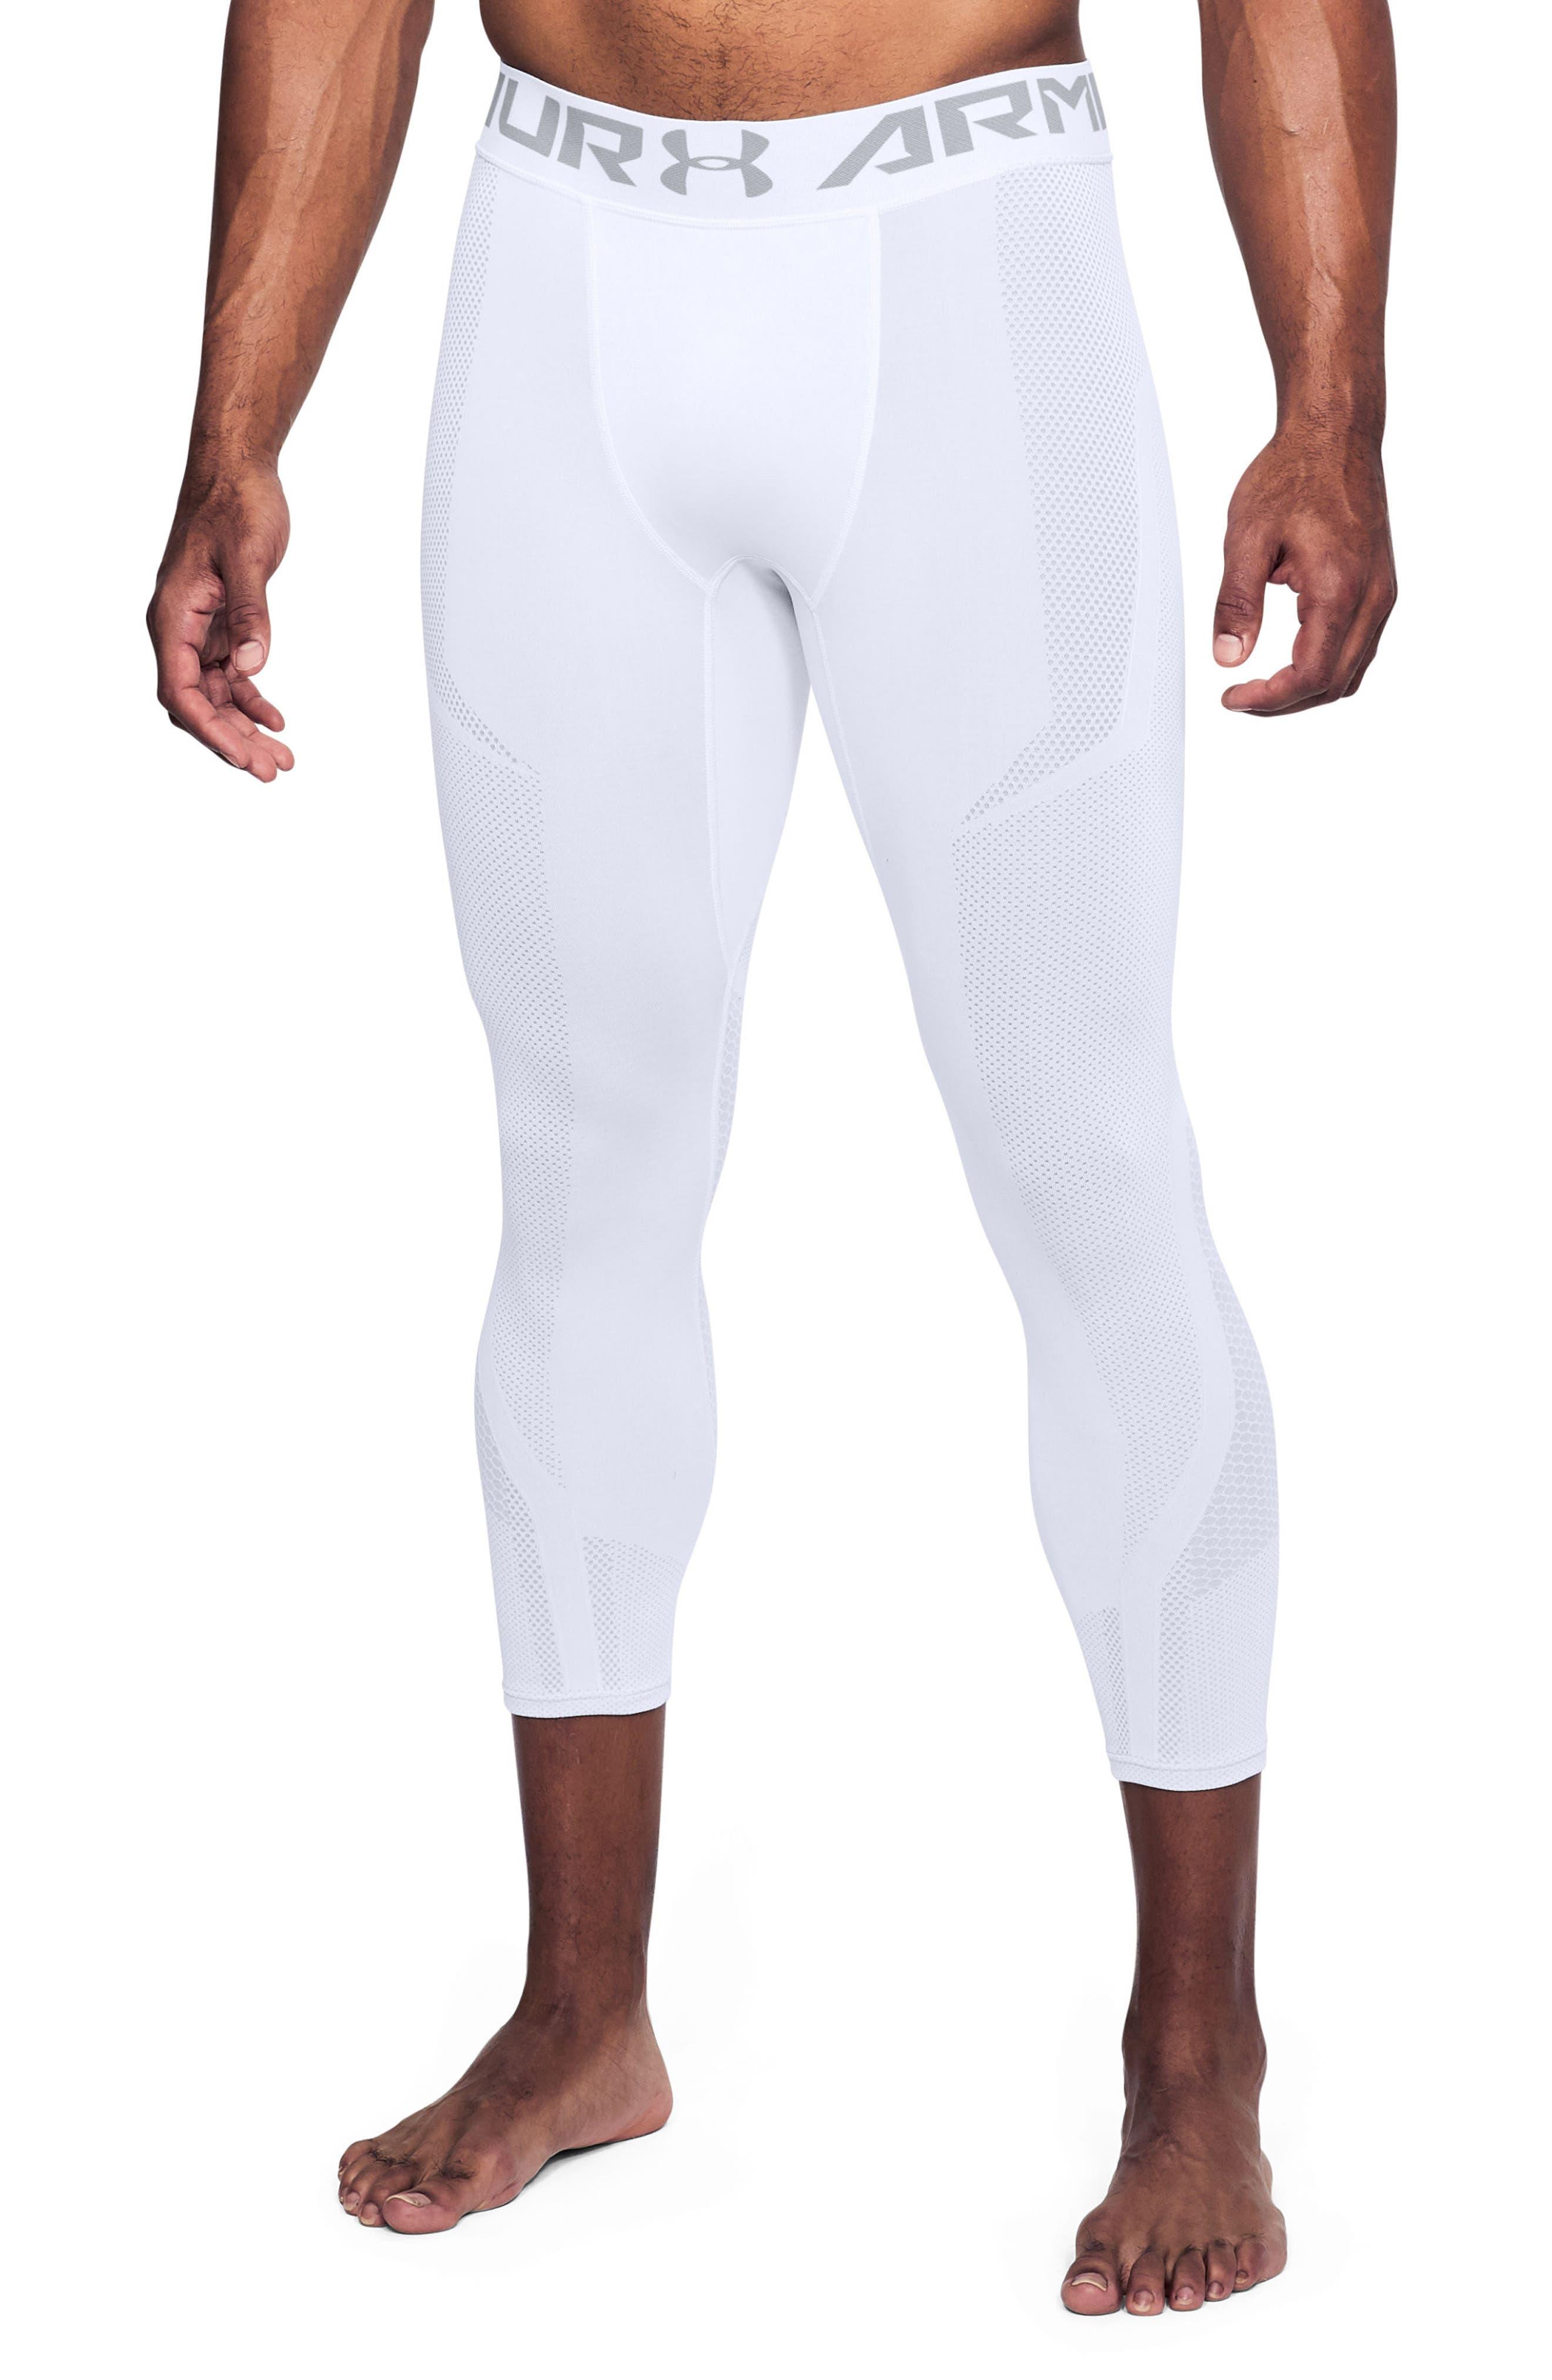 Threadborne Seamless Pants,                         Main,                         color, White/ Overcast Gray